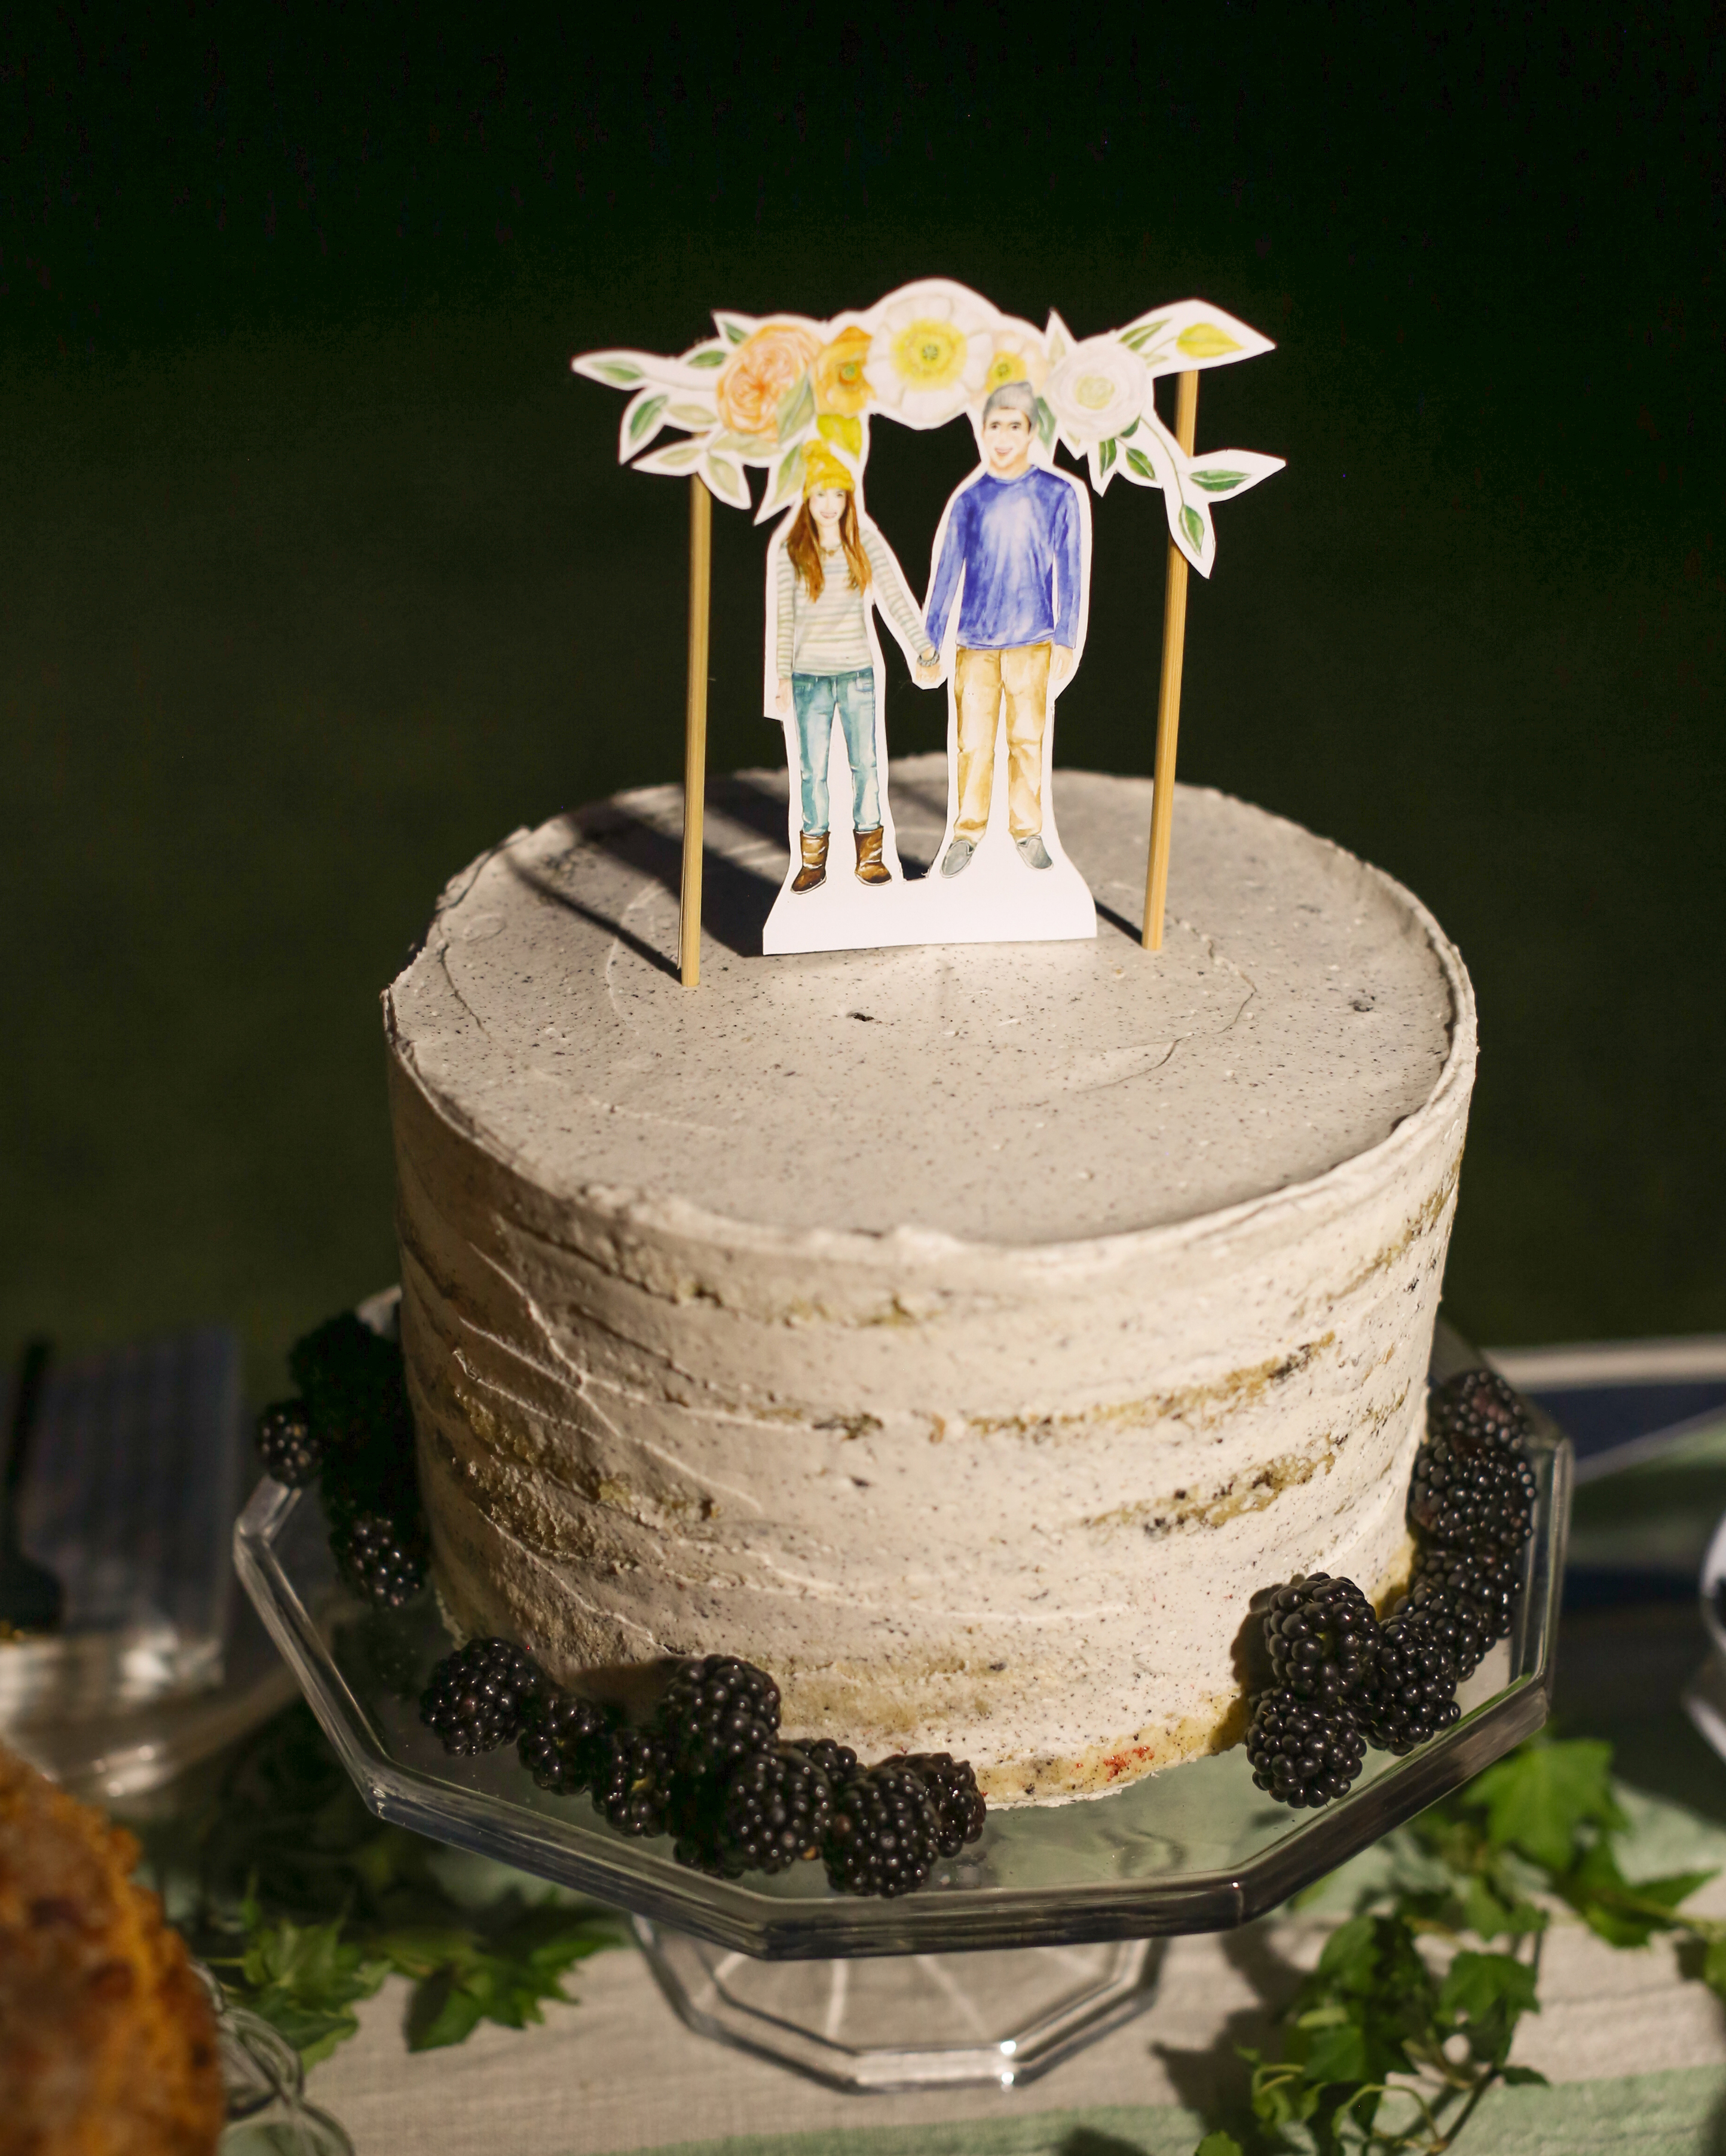 lana-danny-wedding-cake-674-s111831-0315.jpg